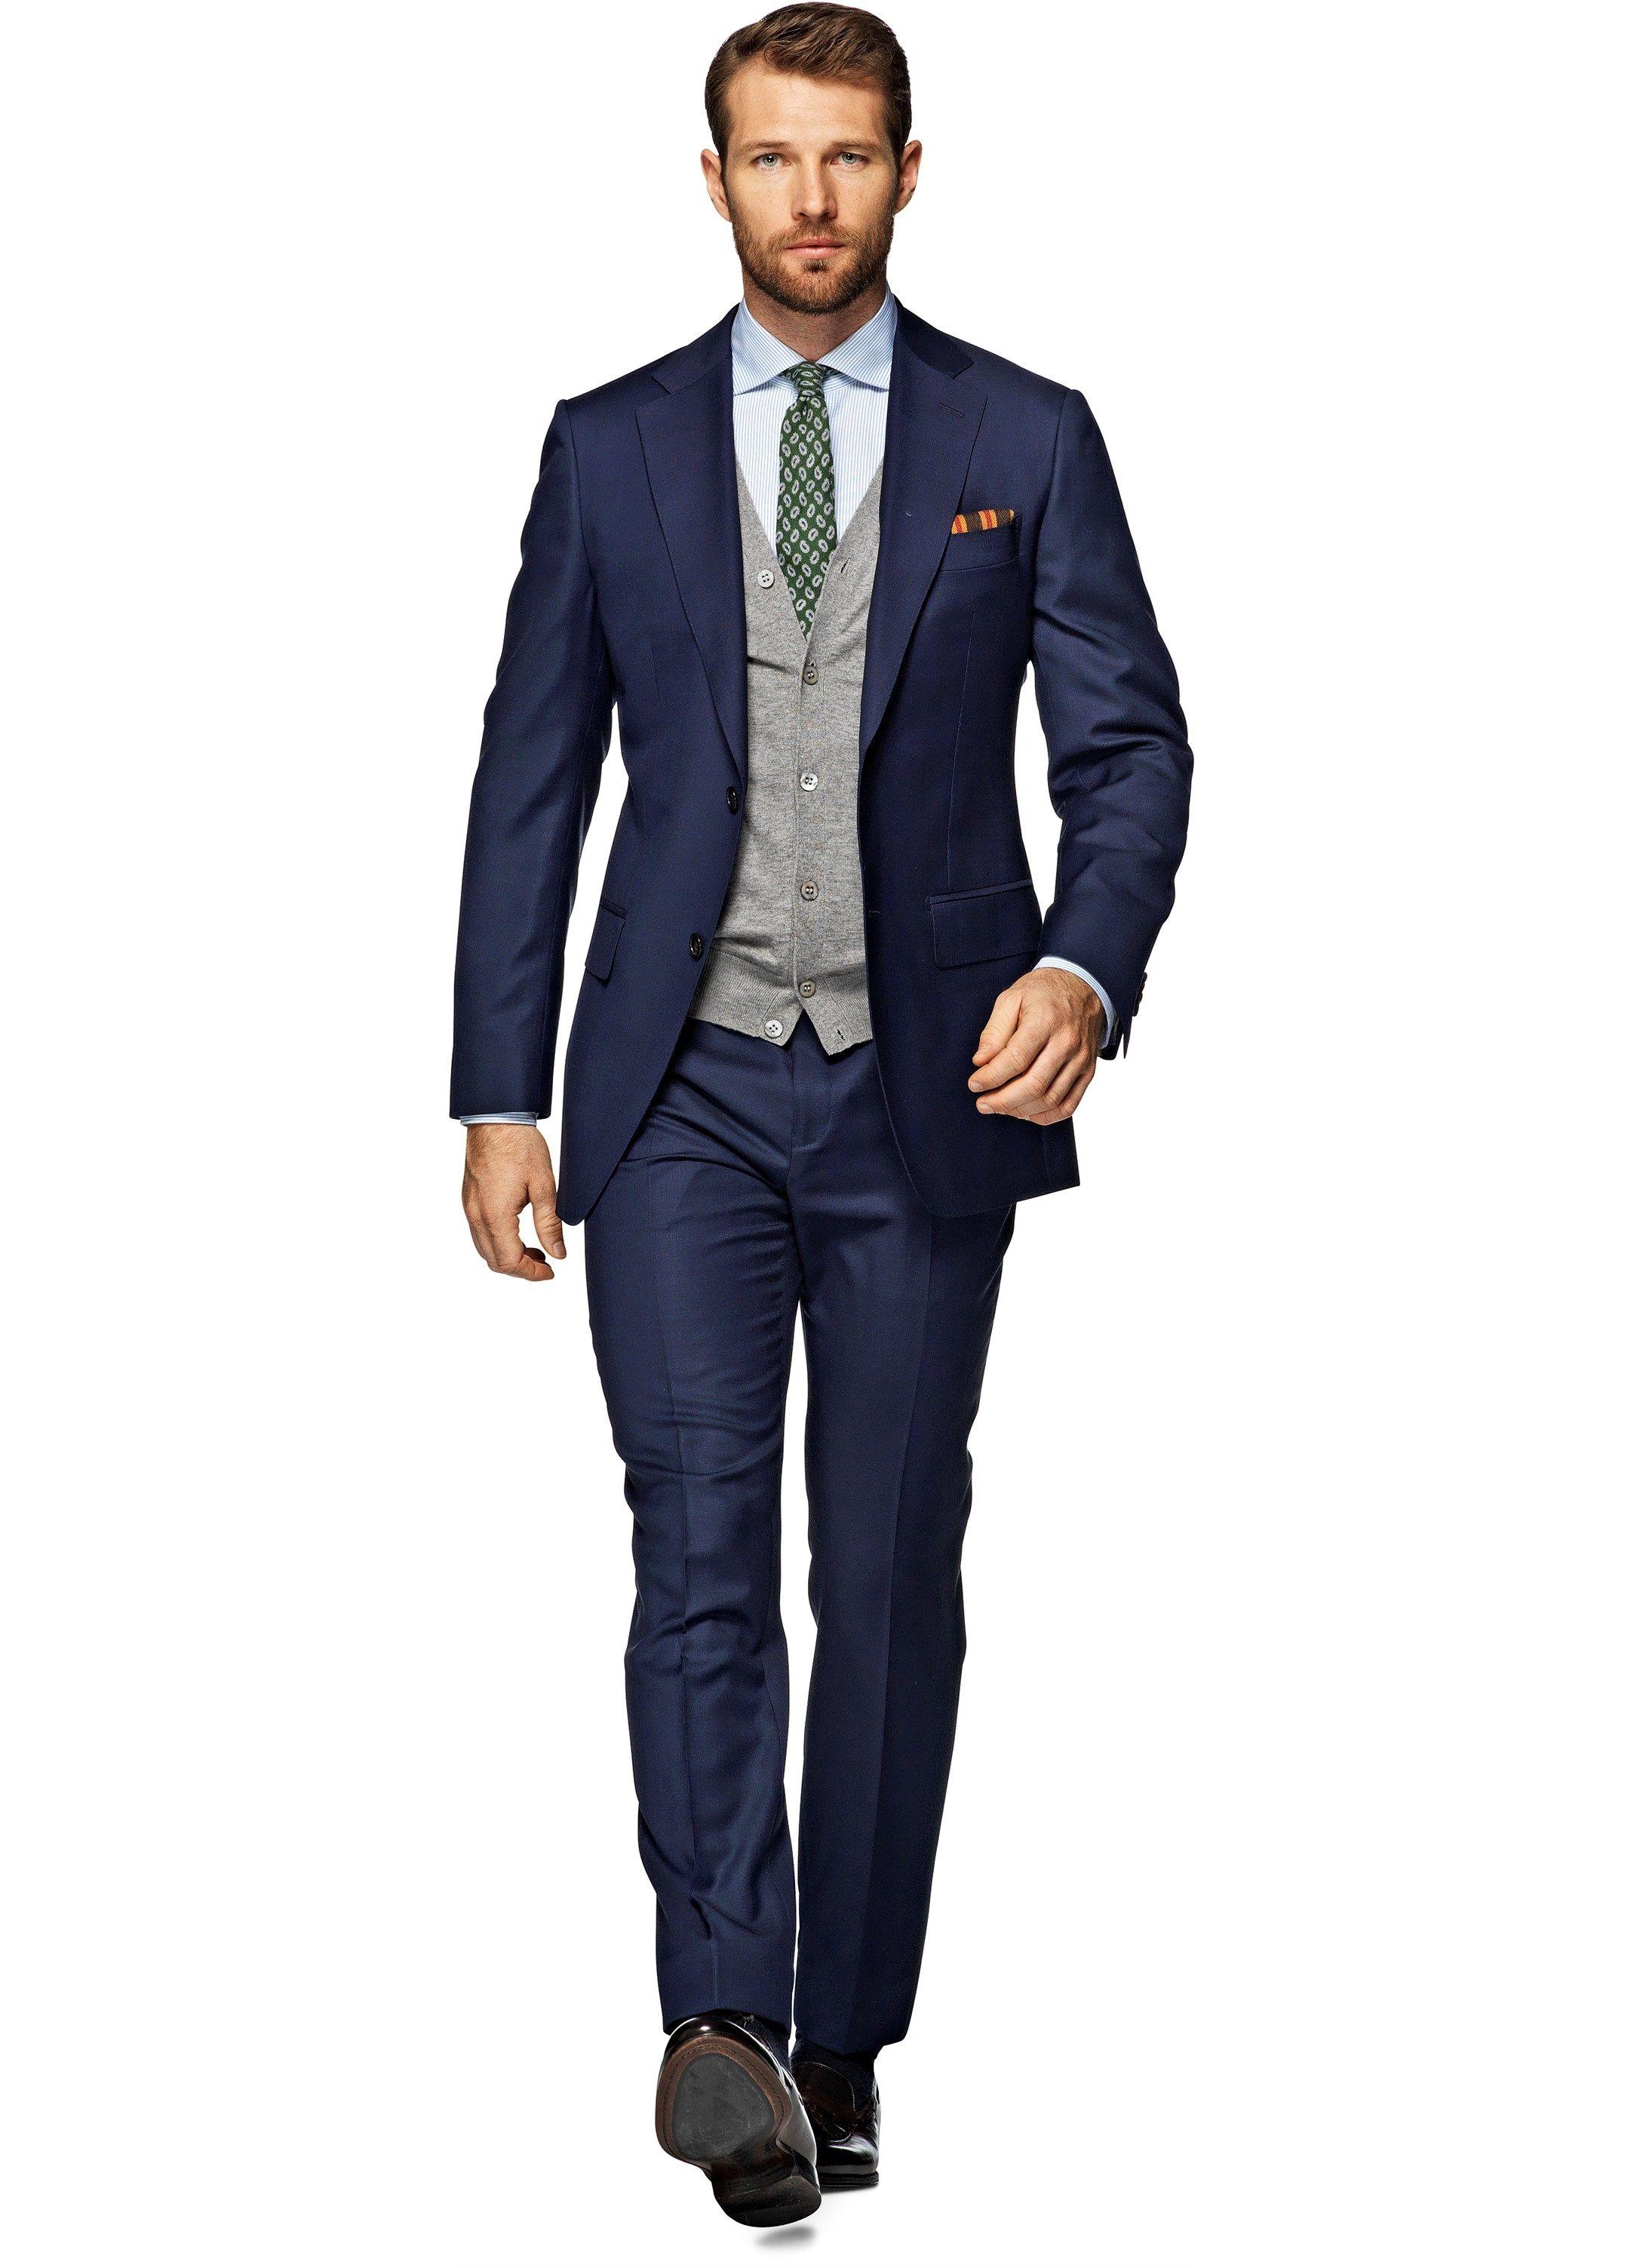 Suit Blue Plain Napoli P3458i | Suitsupply Online Store Not that I ...